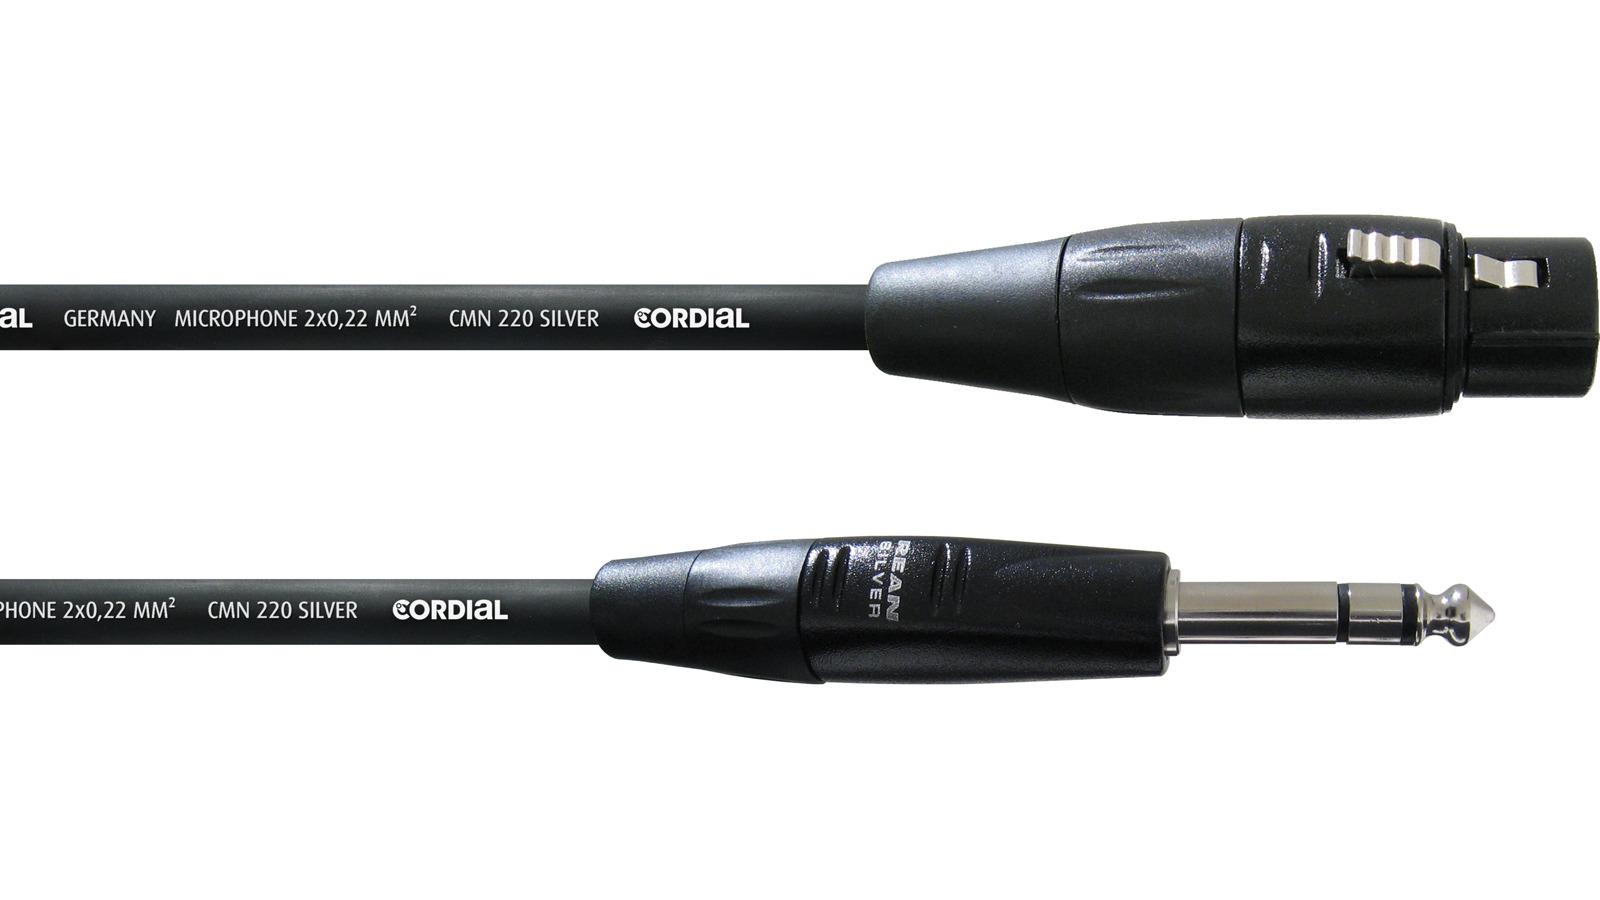 Cordial symmetrisches Klinke XLR female Mikrofonkabel 9 m CIM9FV